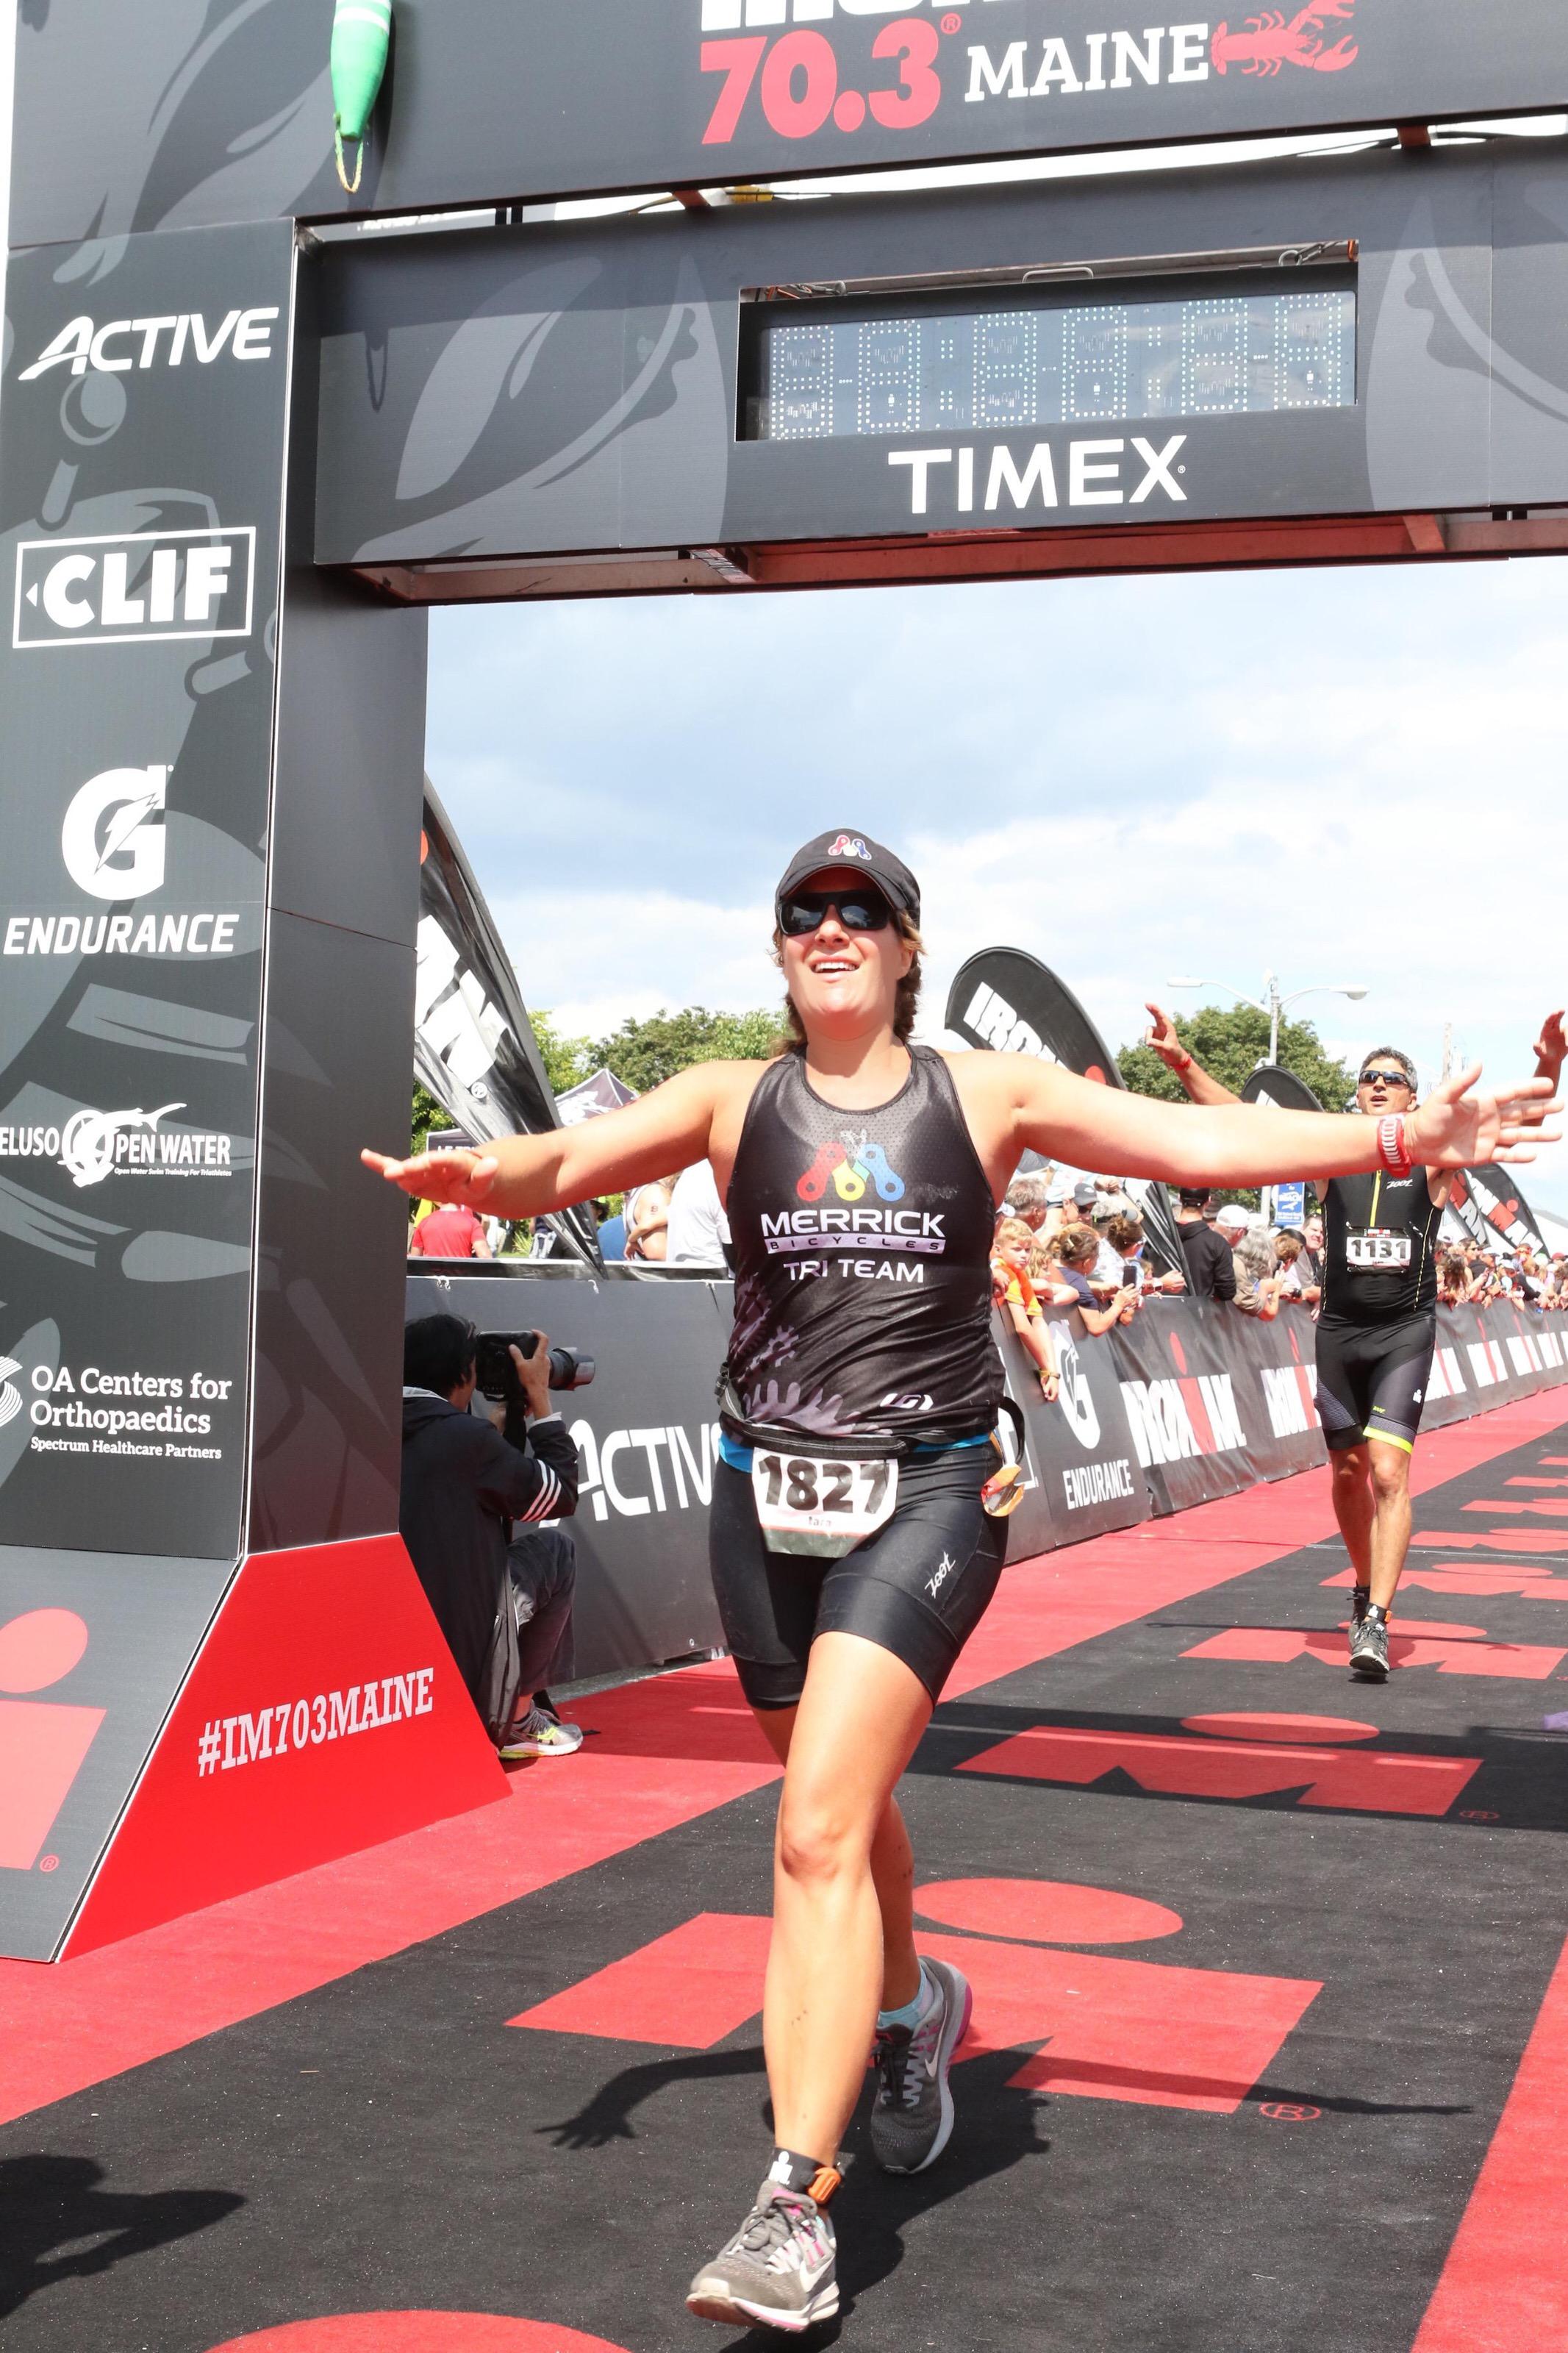 Tara Hofmayer - 2018 Ironman Maine 70.3 Finisher